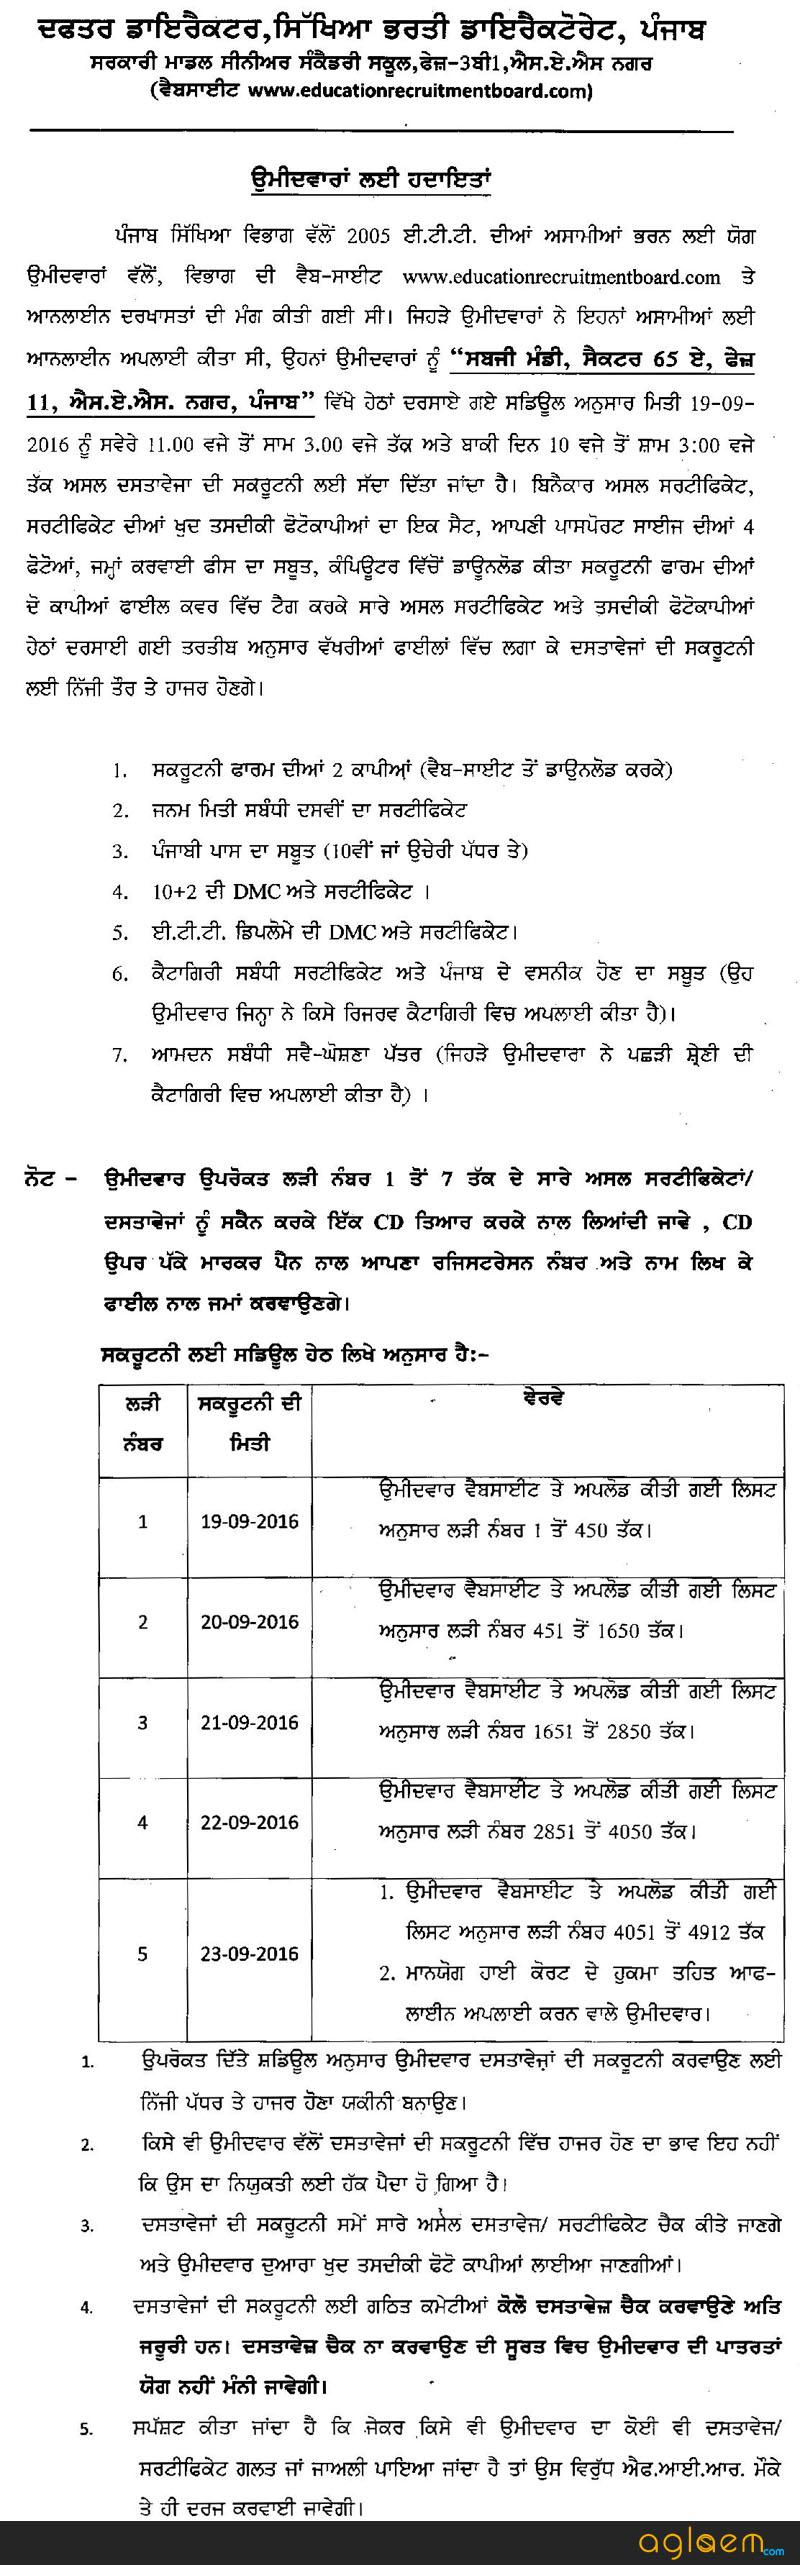 ETT Punjab Recruitment 2016 - PSEB Teacher Recruitment